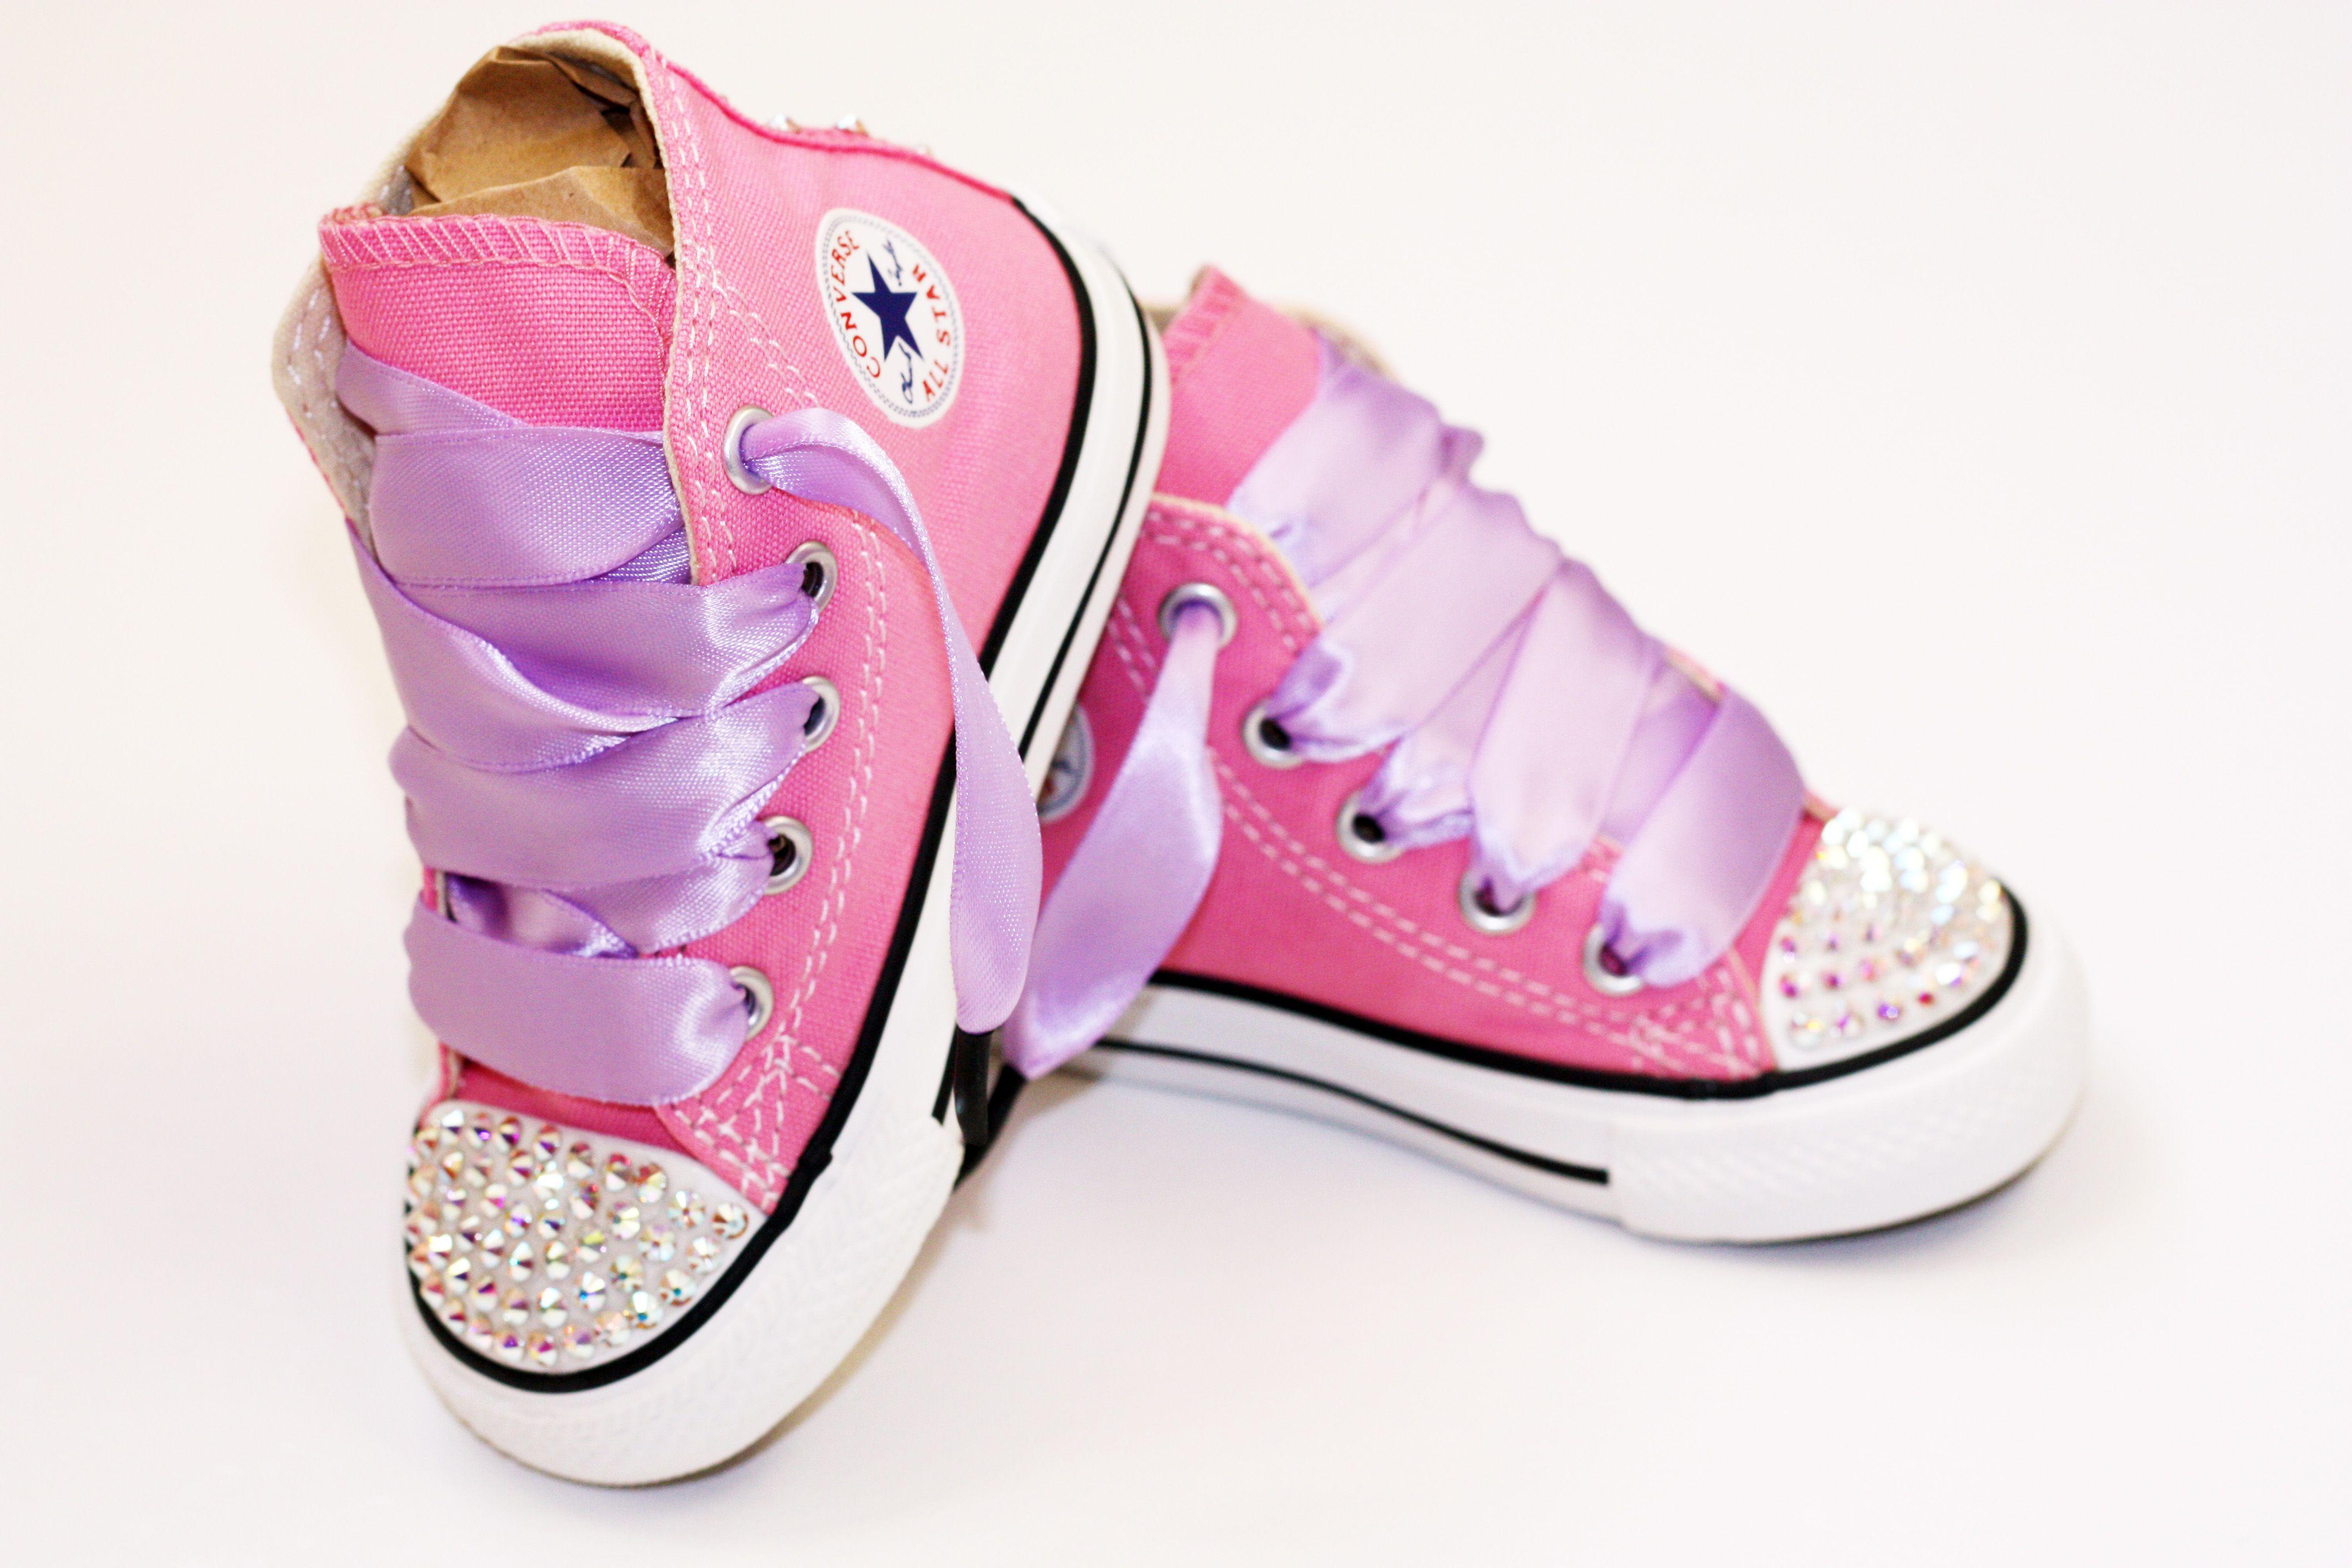 Toddler Hi-Top Pink Converse Chuck Taylor's With Swarovski ...